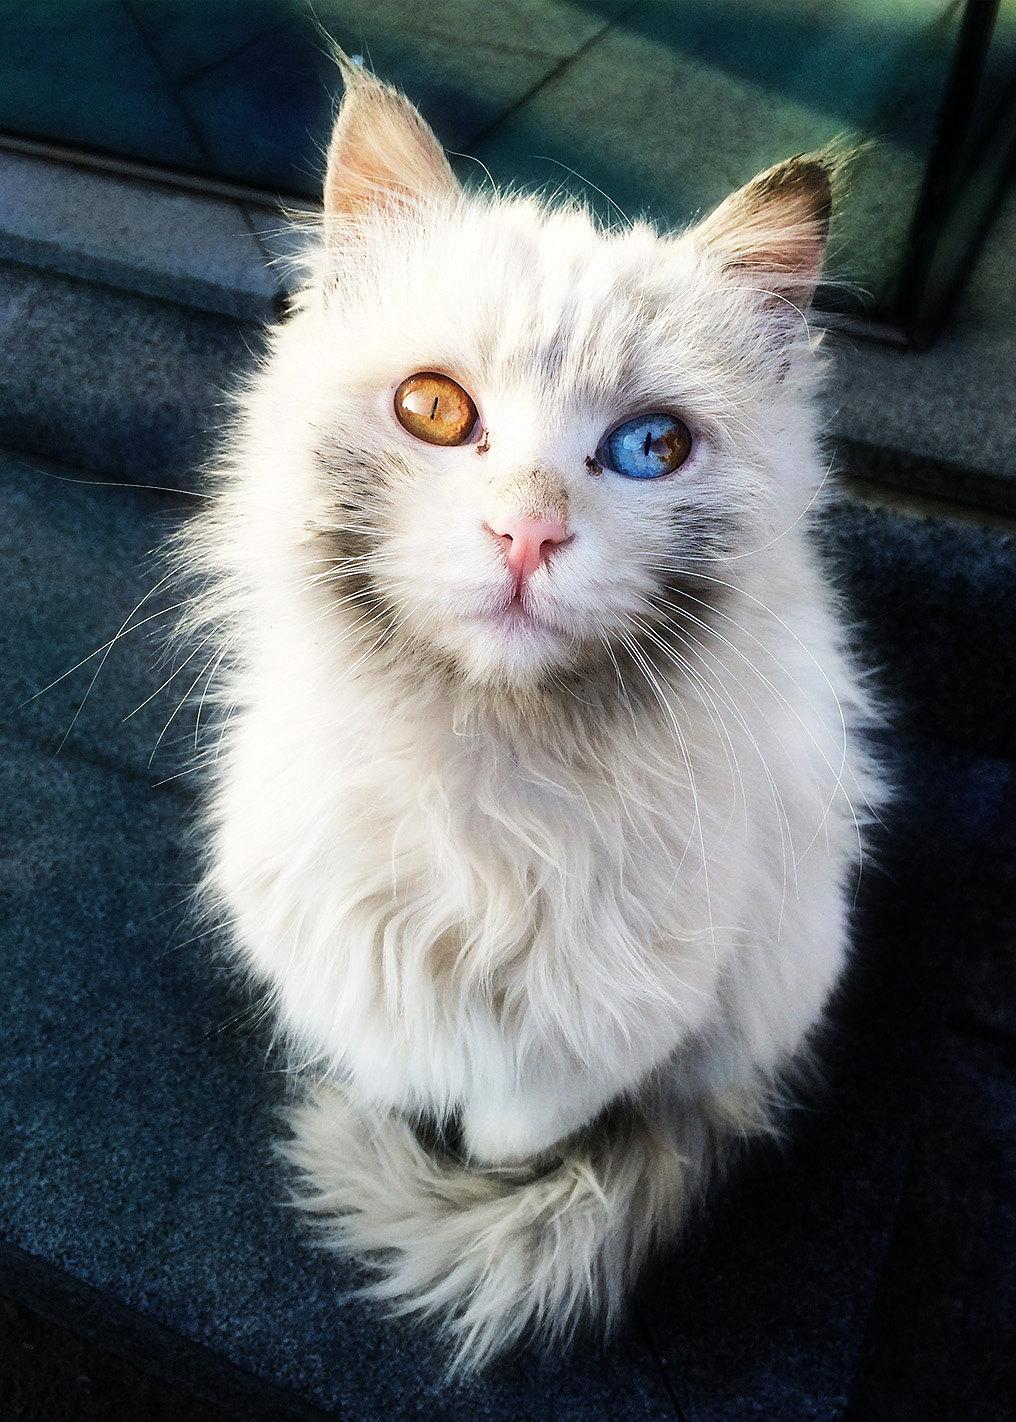 sokaktan-kedi-sahiplenmek-patiliyo-8